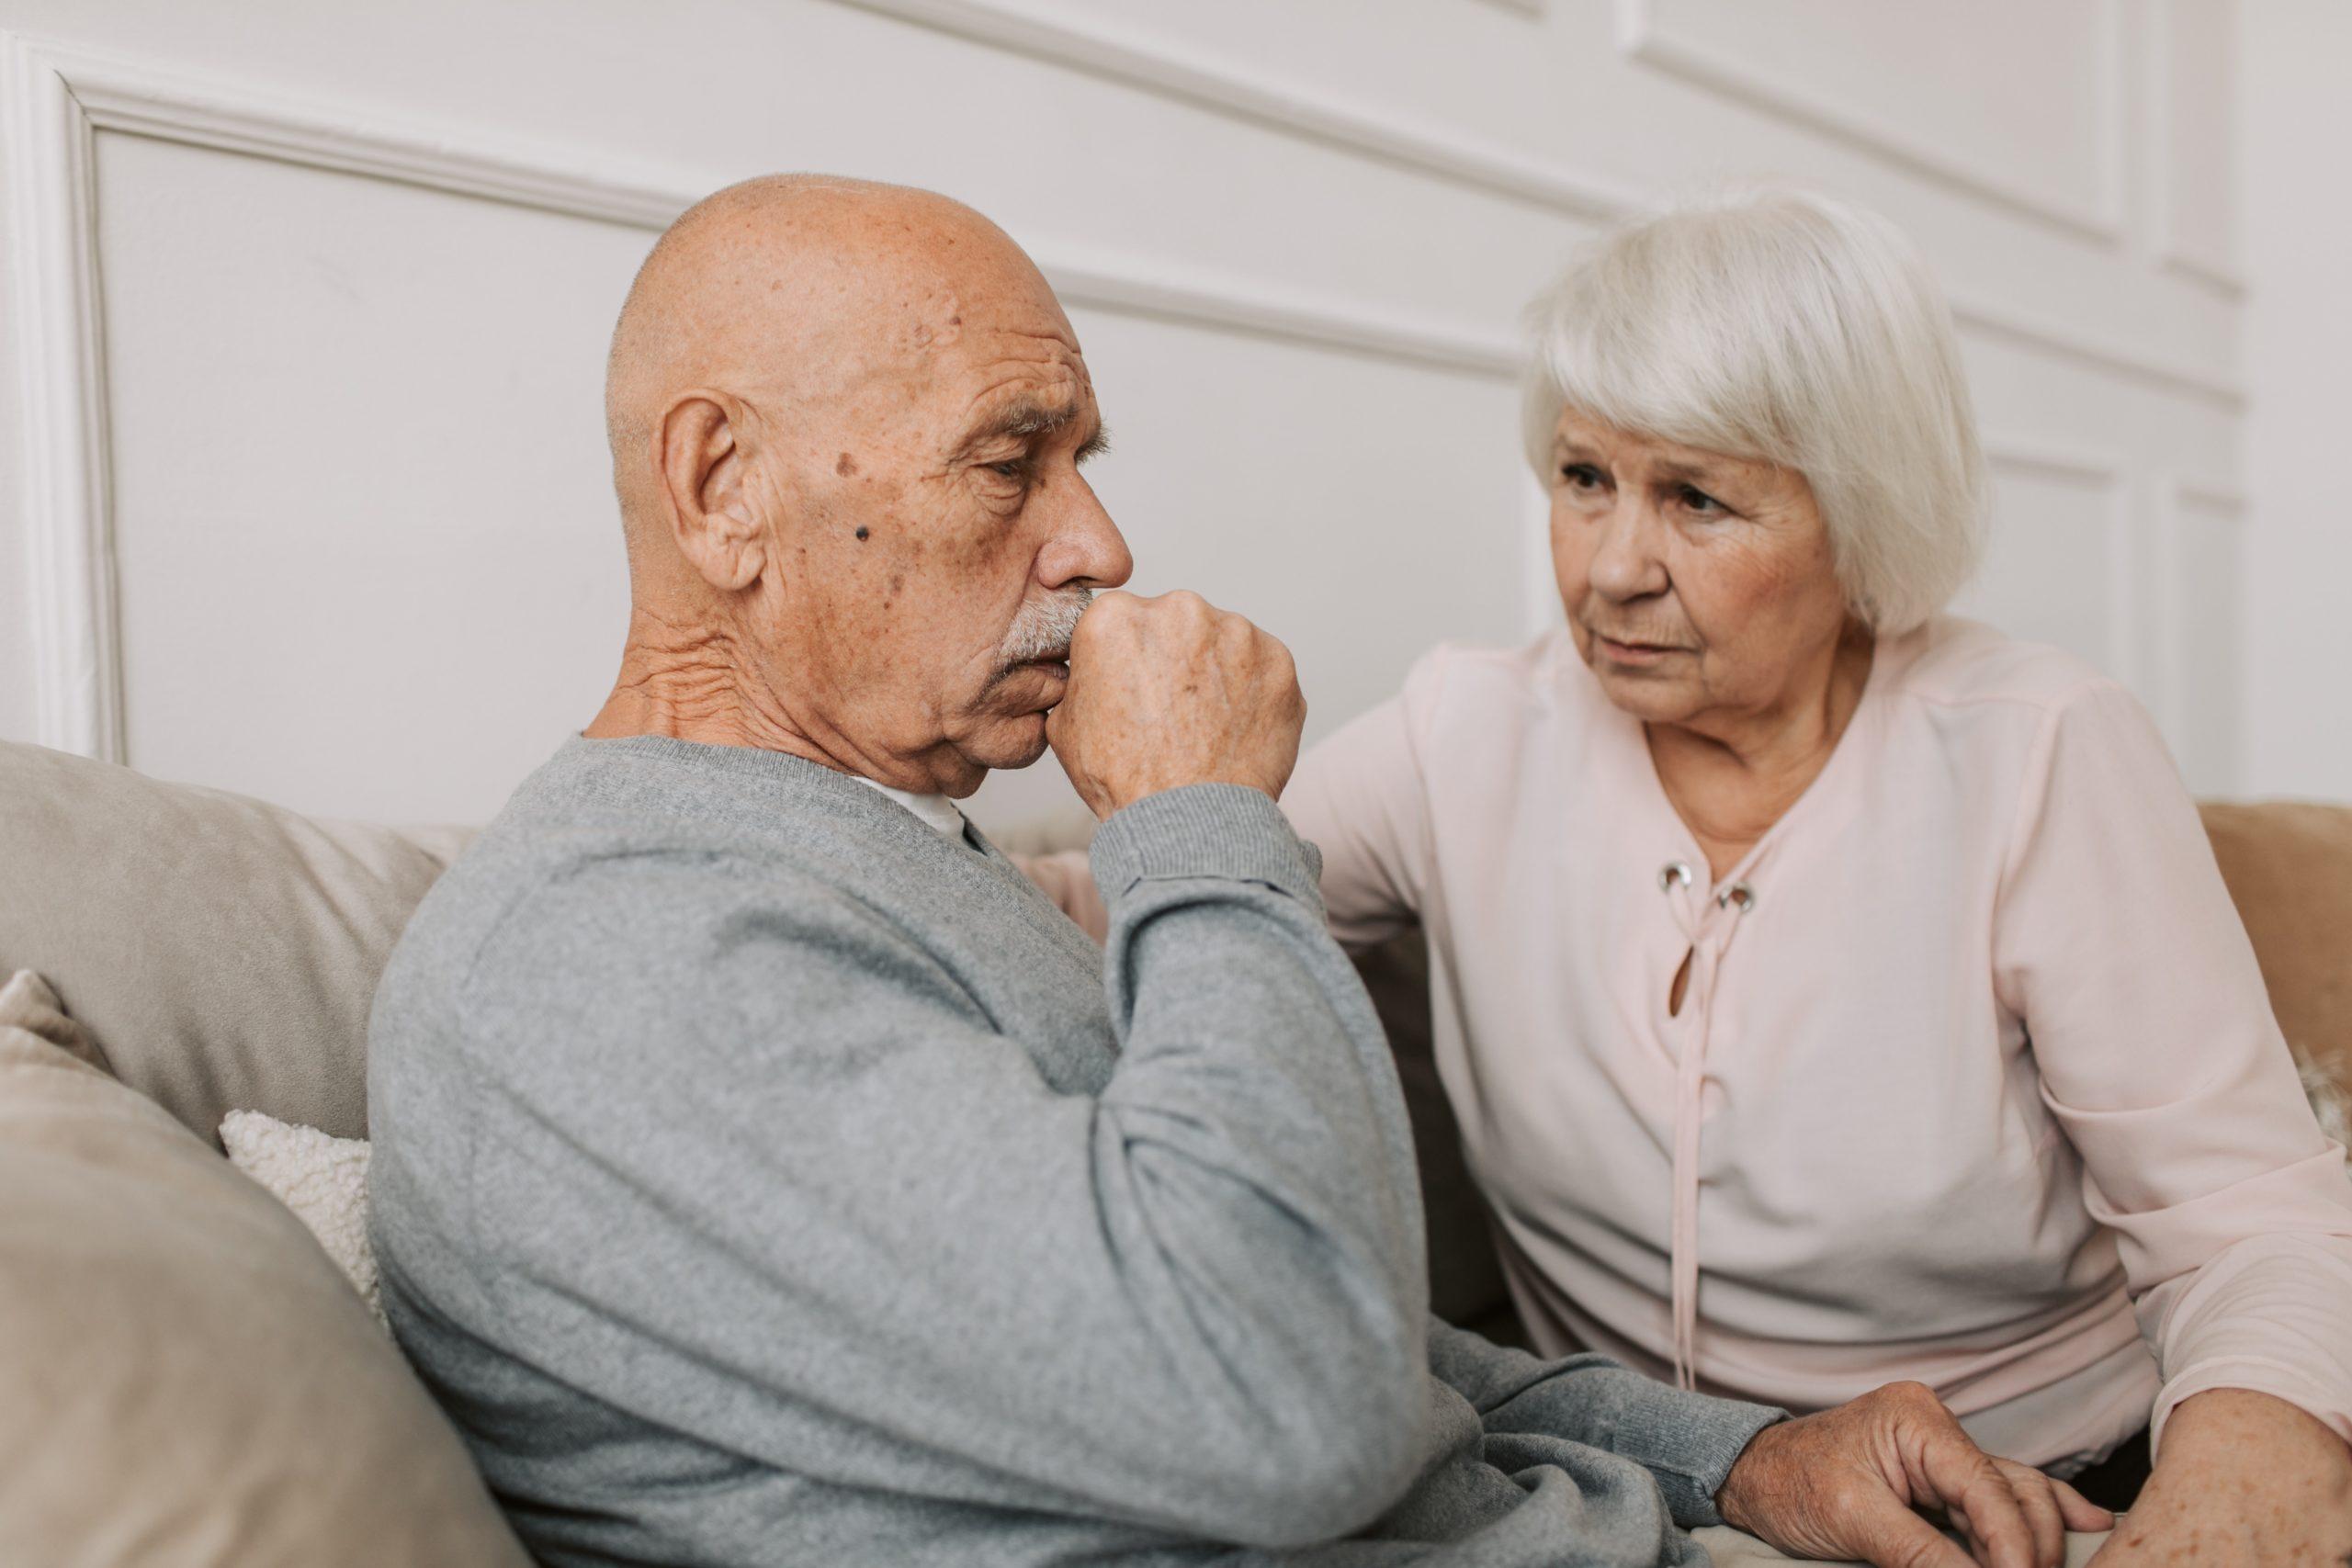 Nursing Homes Begin Limiting Visitors As Virus Spreads